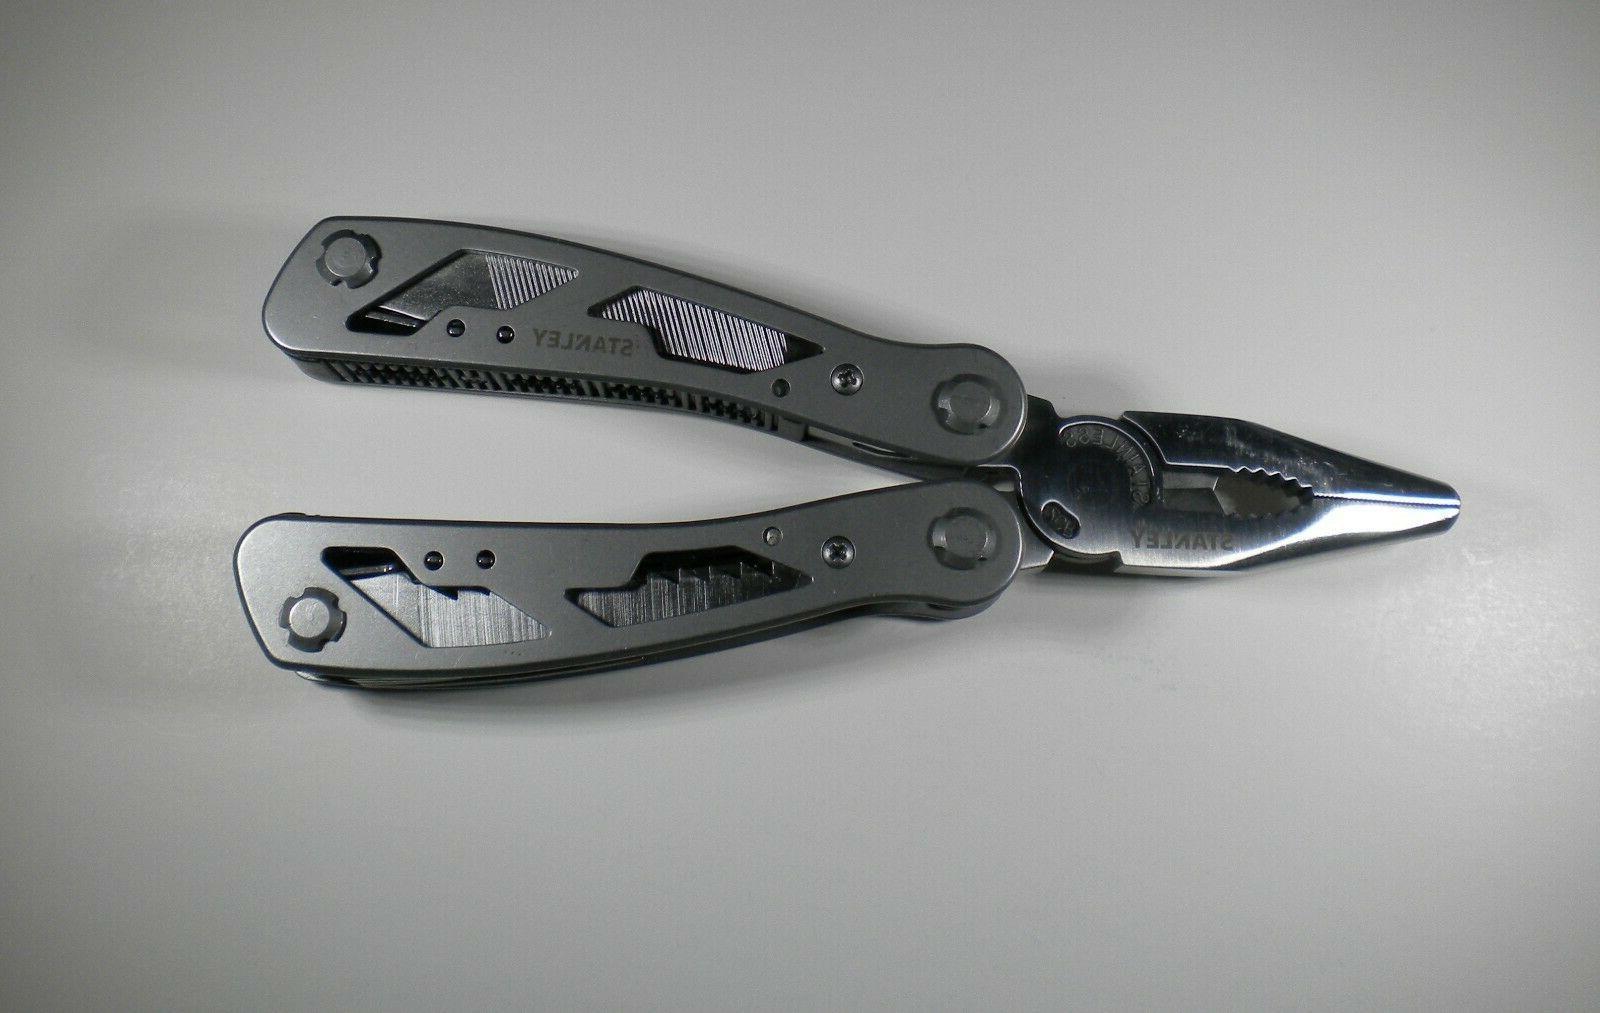 New 12-in-1 Multi-Tool Long knife, file